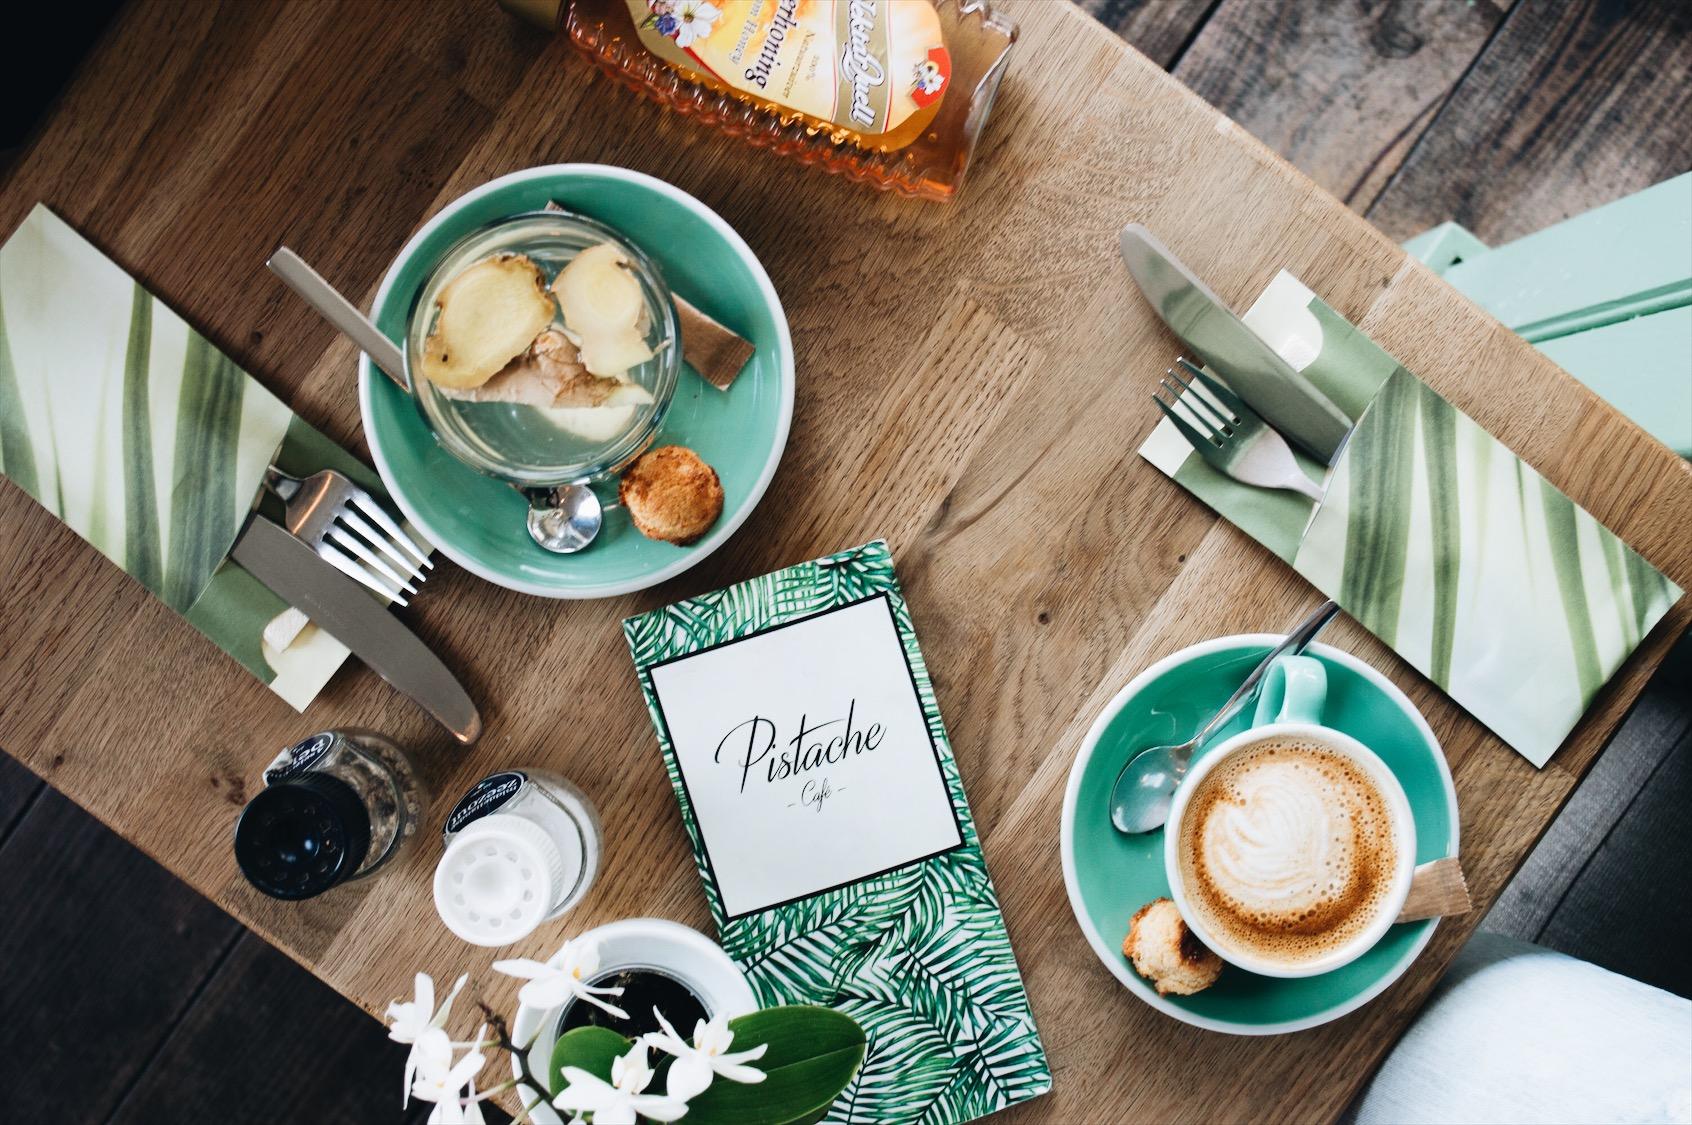 Just enjoying my cappuccino at Pistache Café. Love it!